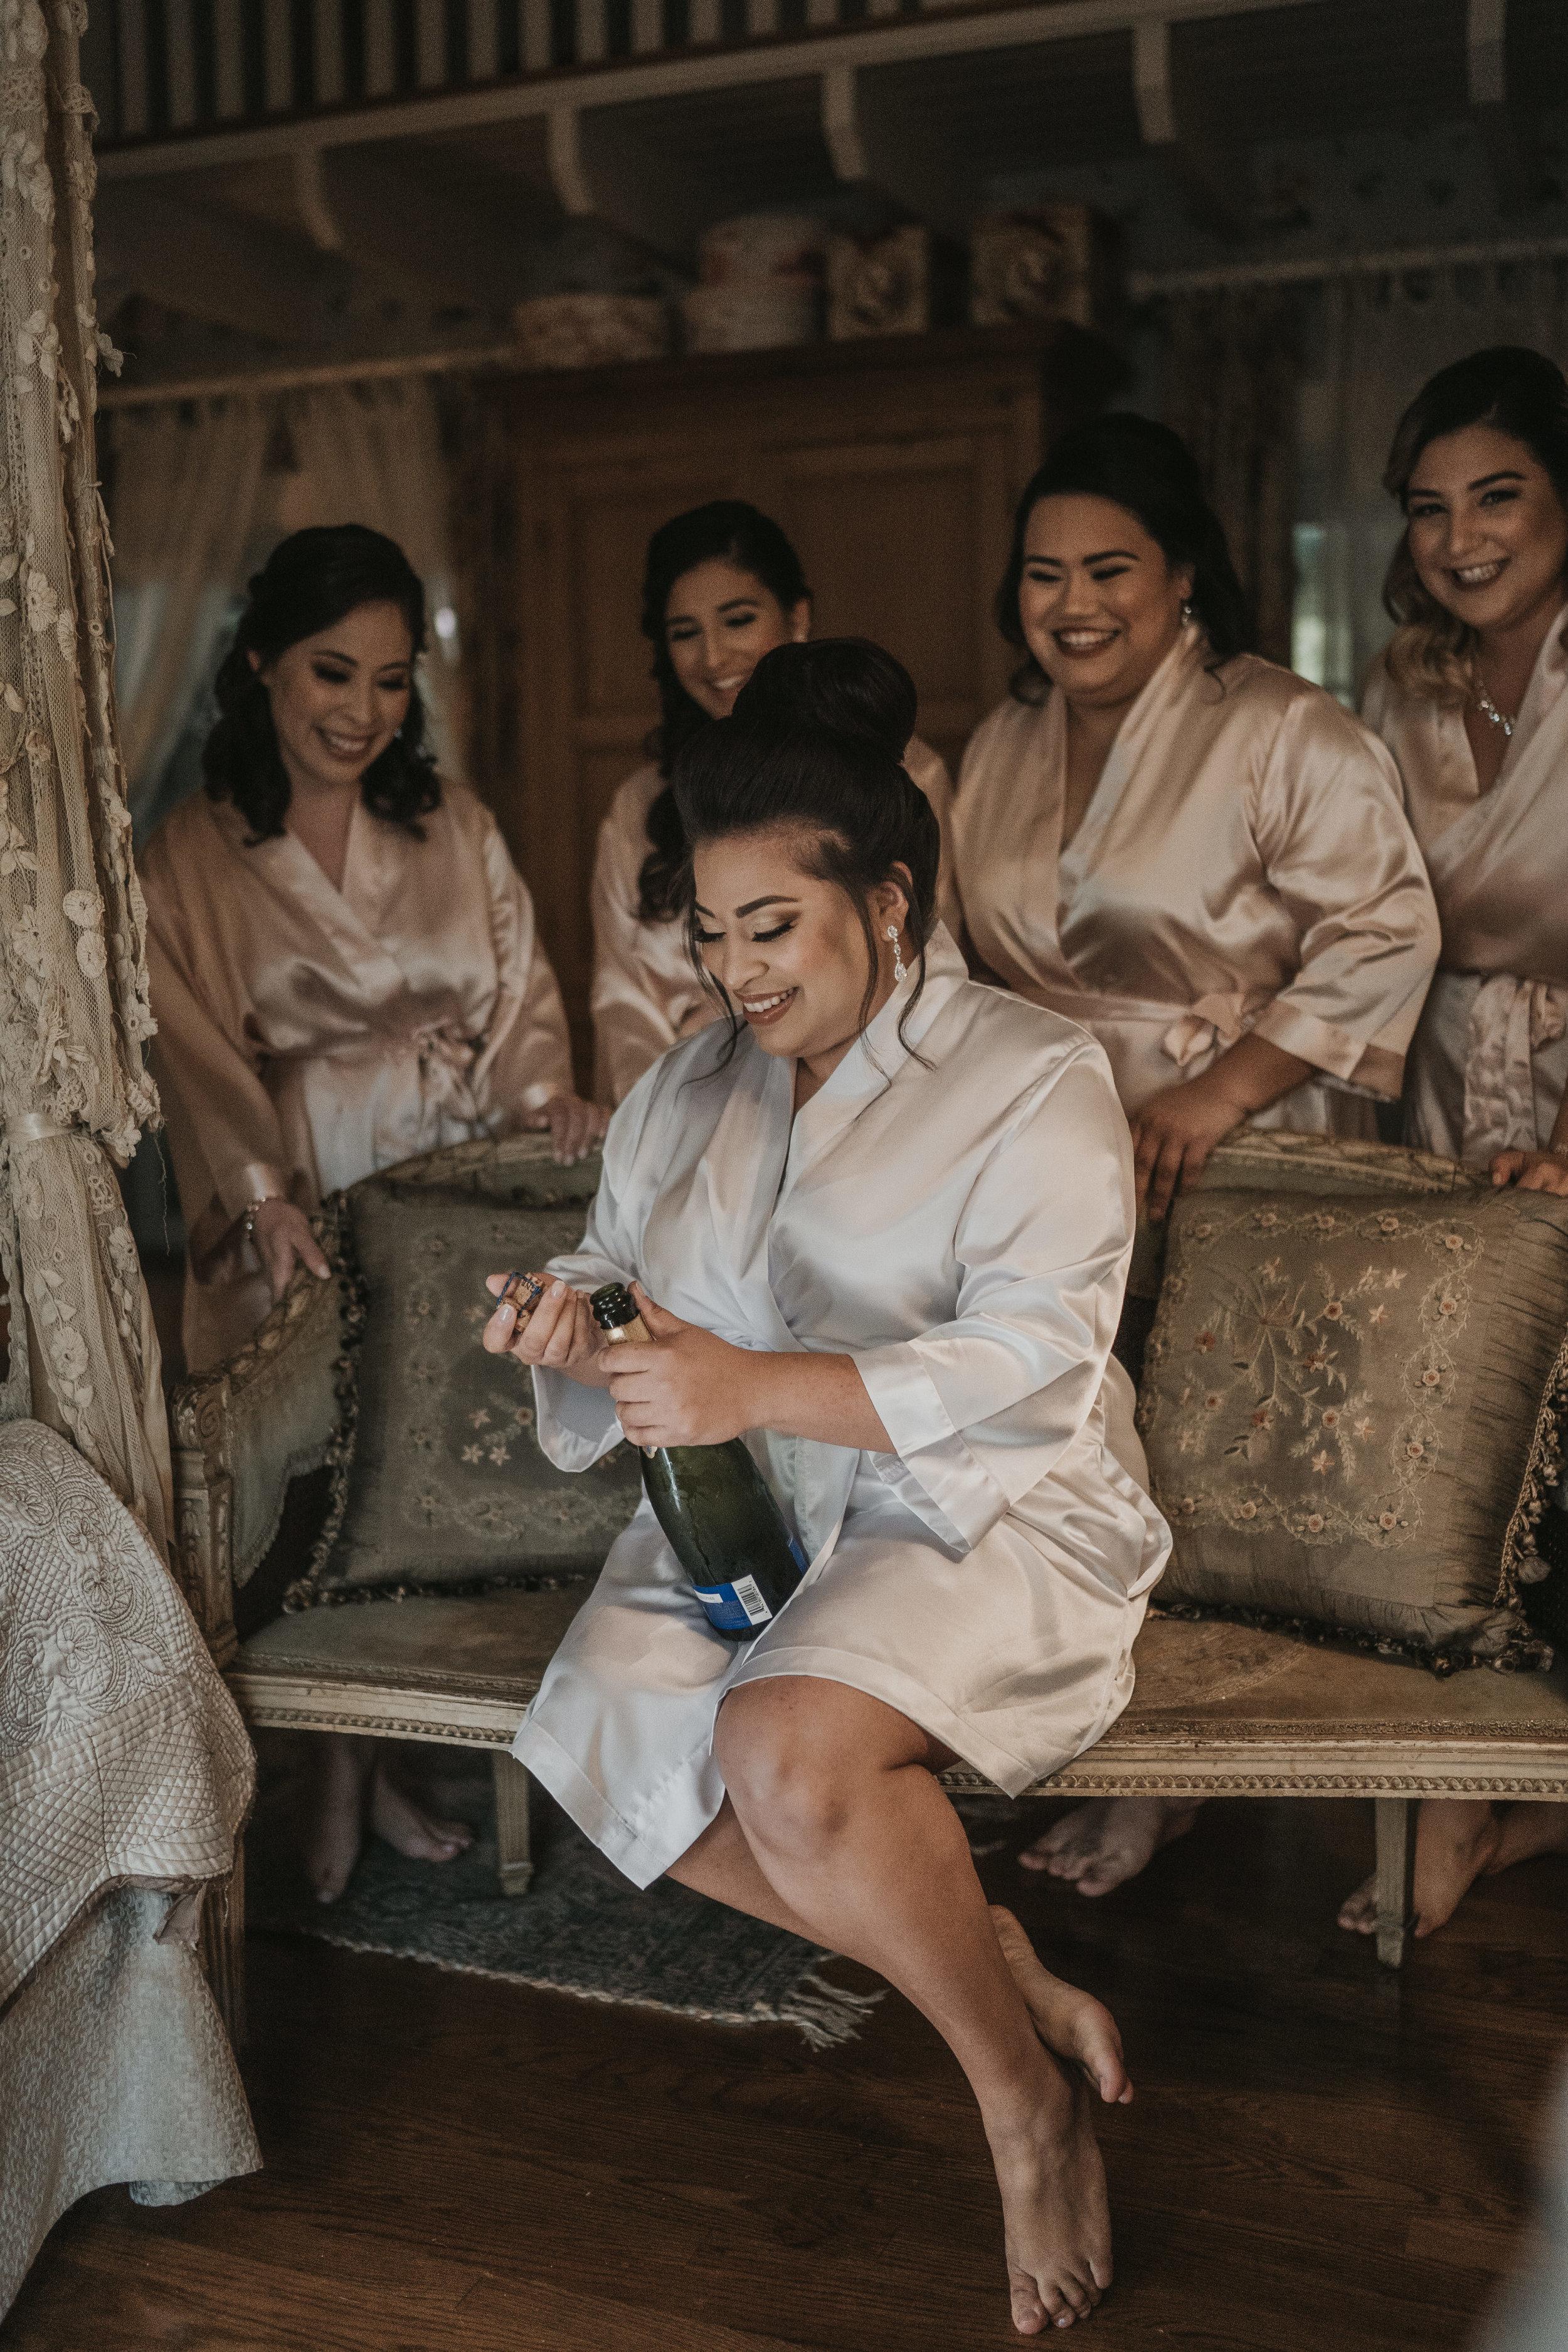 160MICHI&GABEWEDDINGDAY(WeddingFinal).jpg